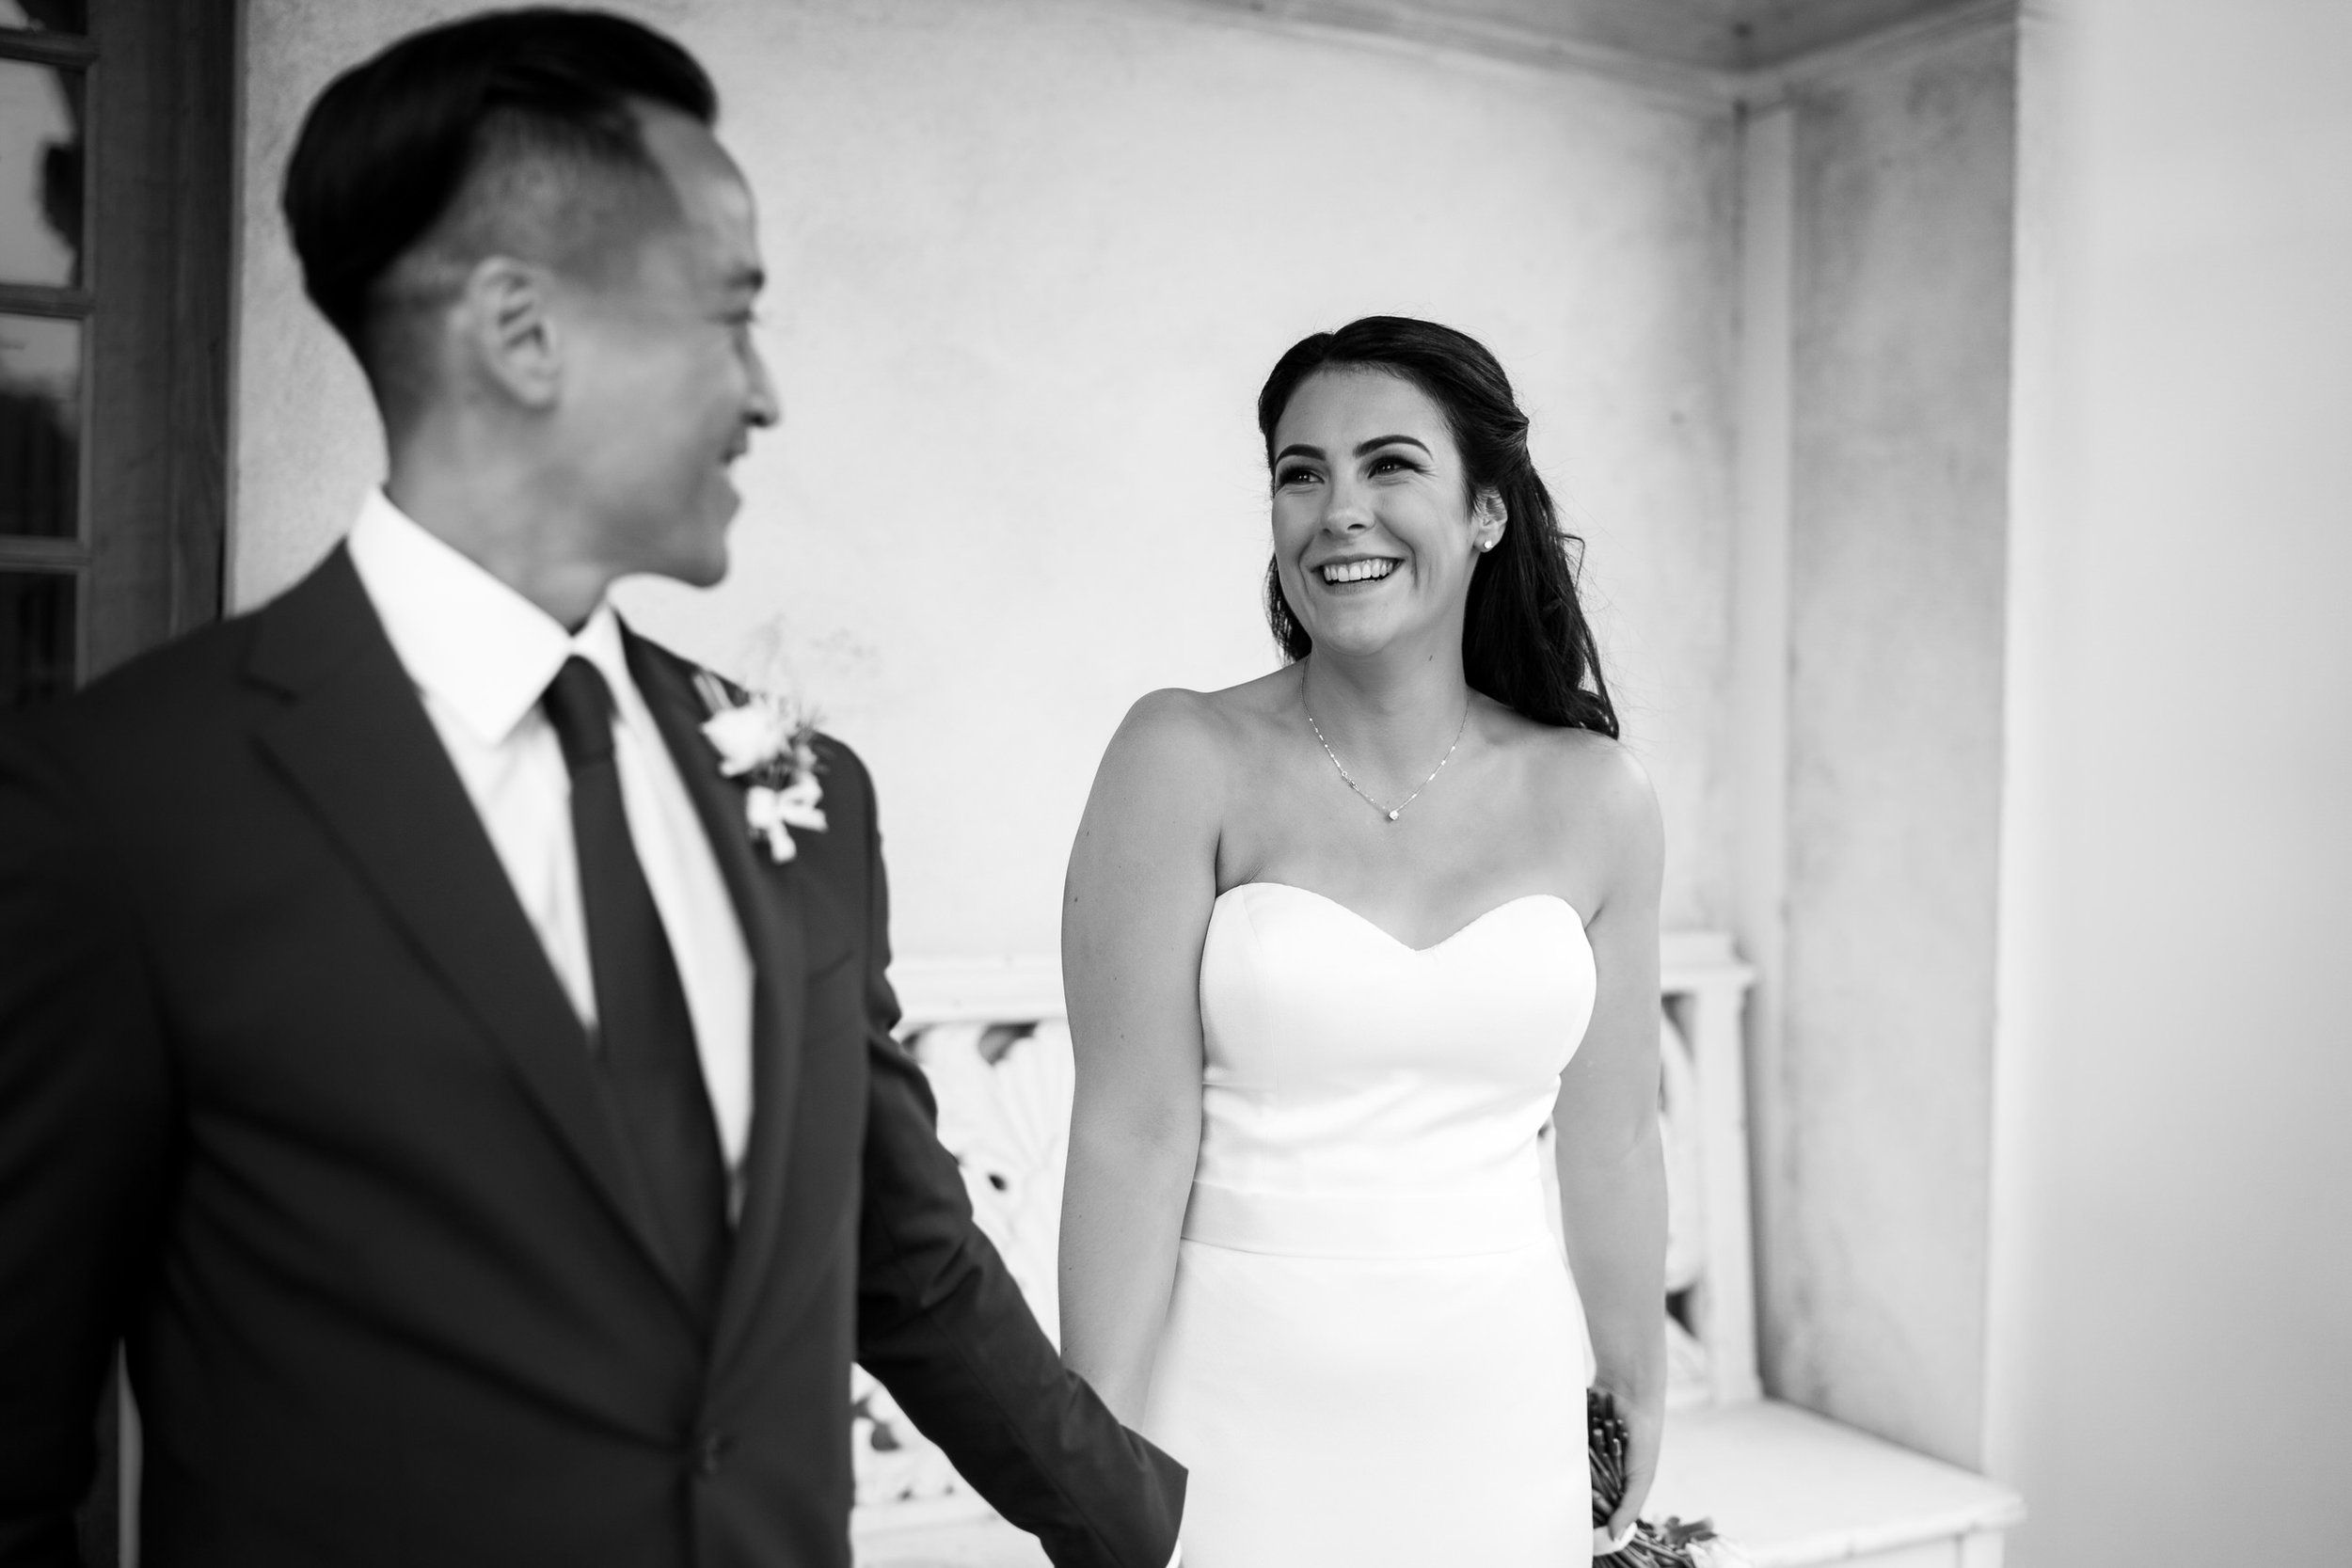 Wedding day bride and groom.jpg